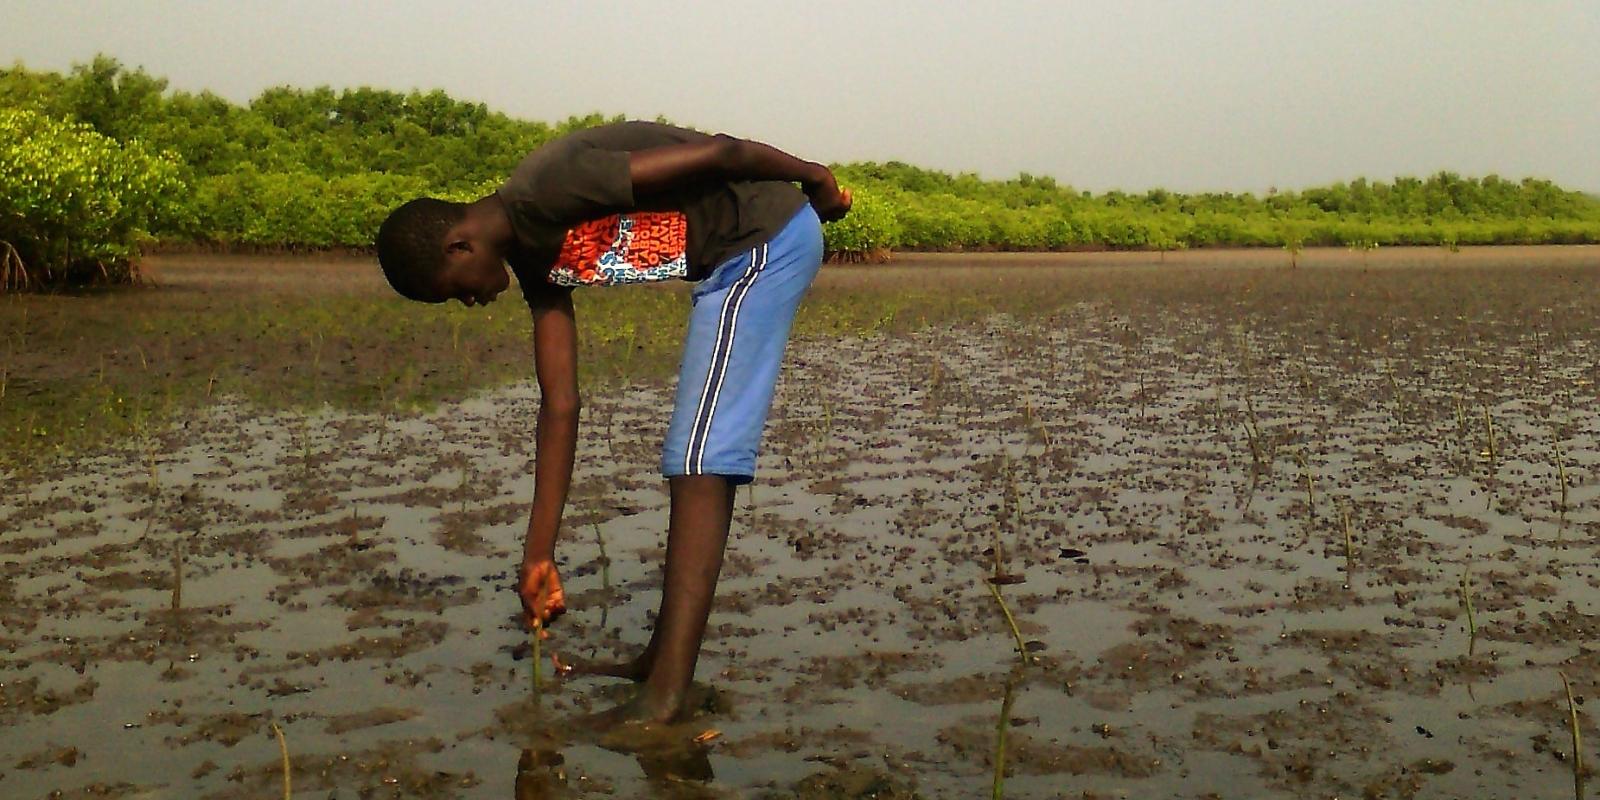 planting_mangroves_in_sine-saloum_delta.jpg?64qe8uFpIKtYIp9GOlaBwr5KwLJy50Ln&itok=4Xp4_KfV